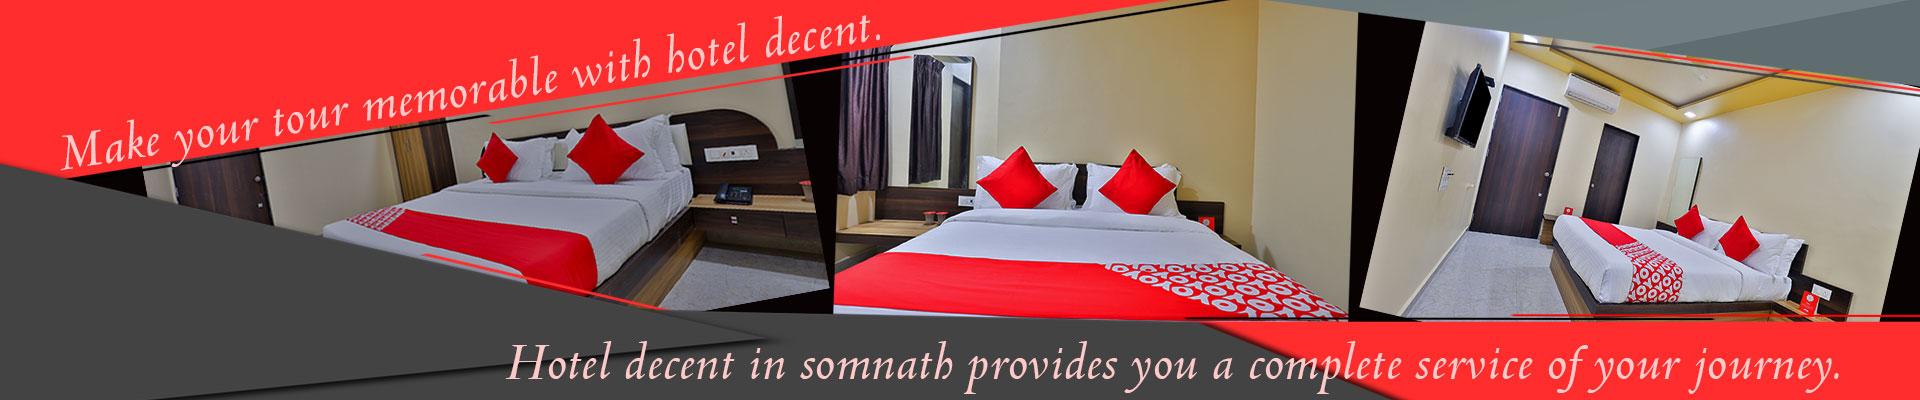 Hotel in somnath gujarat - Classic Room